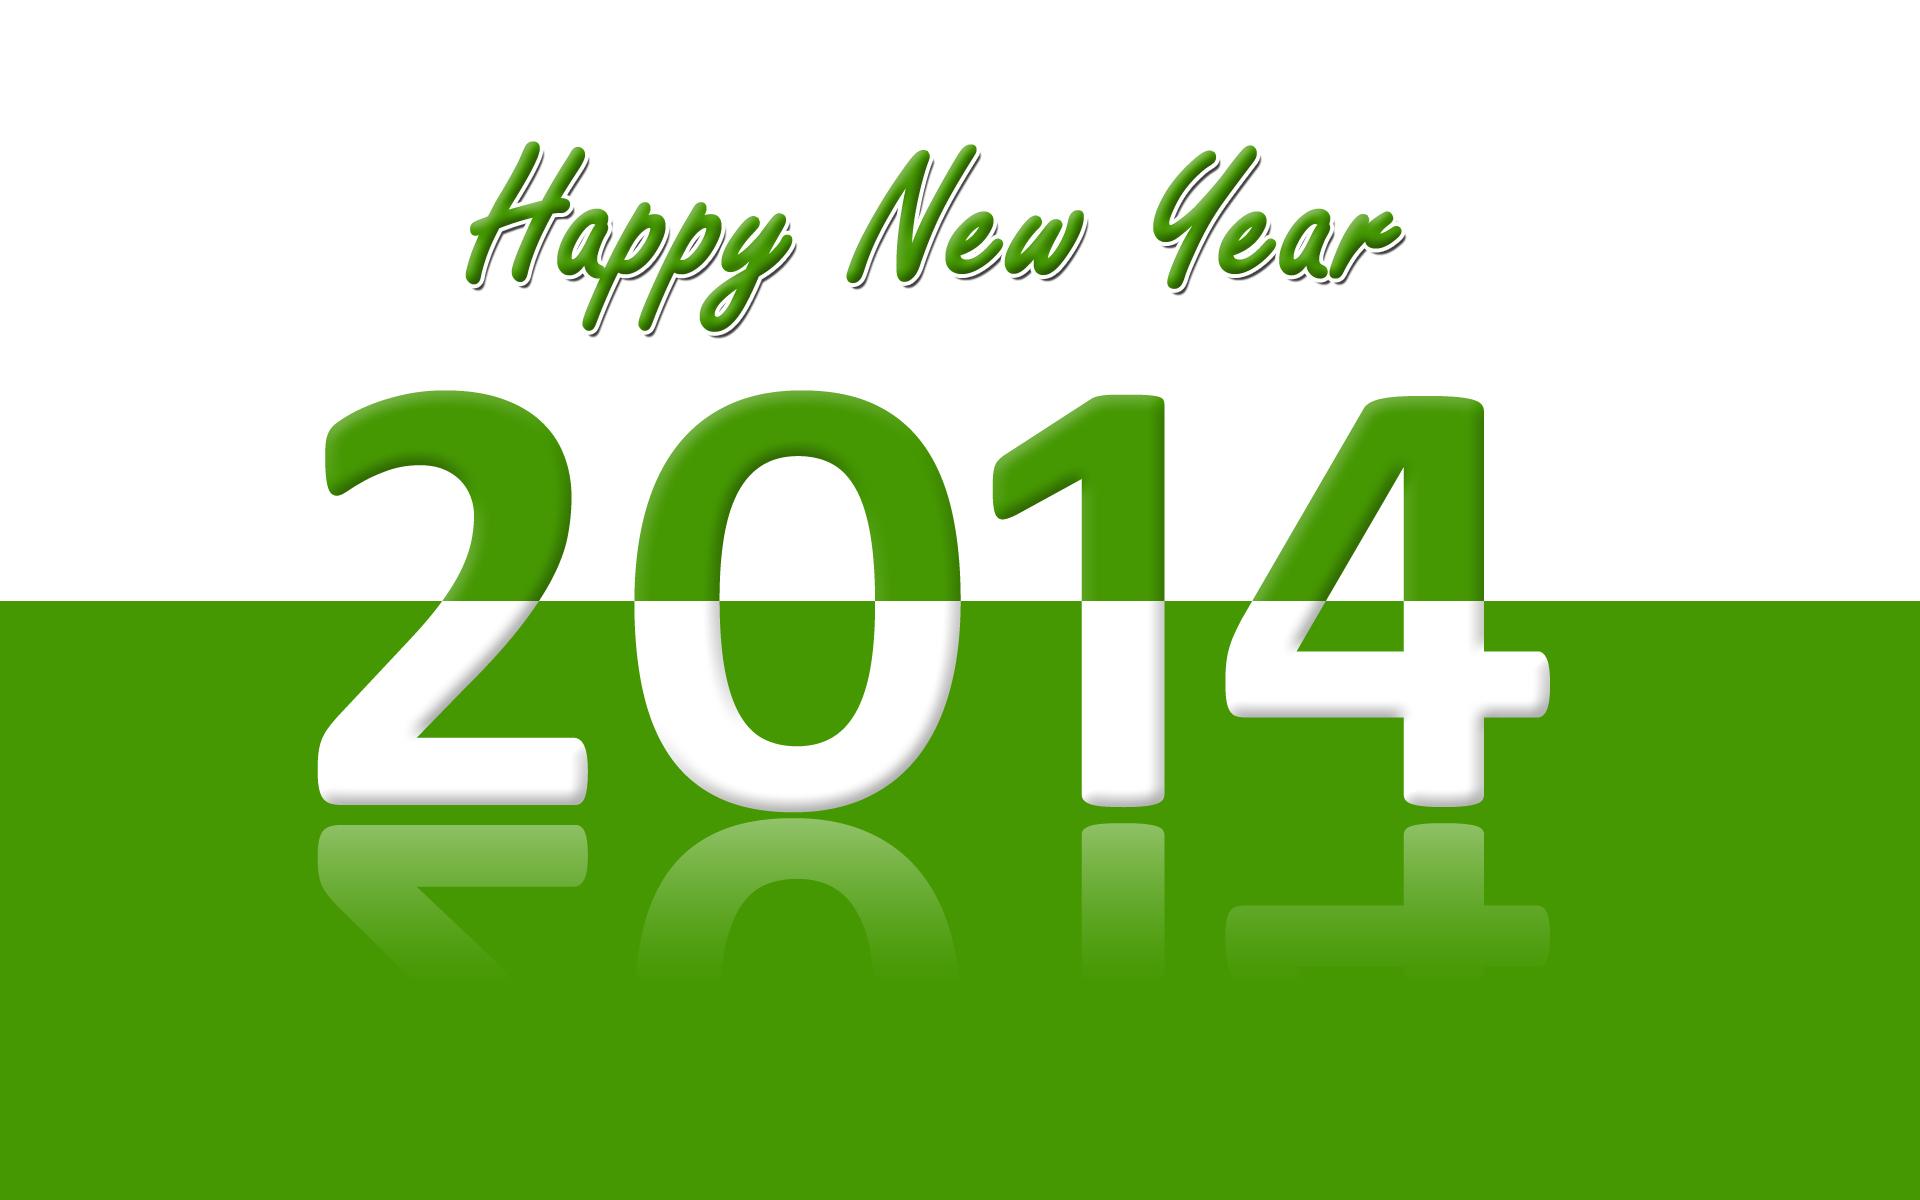 2014, denver replacement windows colorado, trwindowservices, tr window services, denver windows, littleton windows